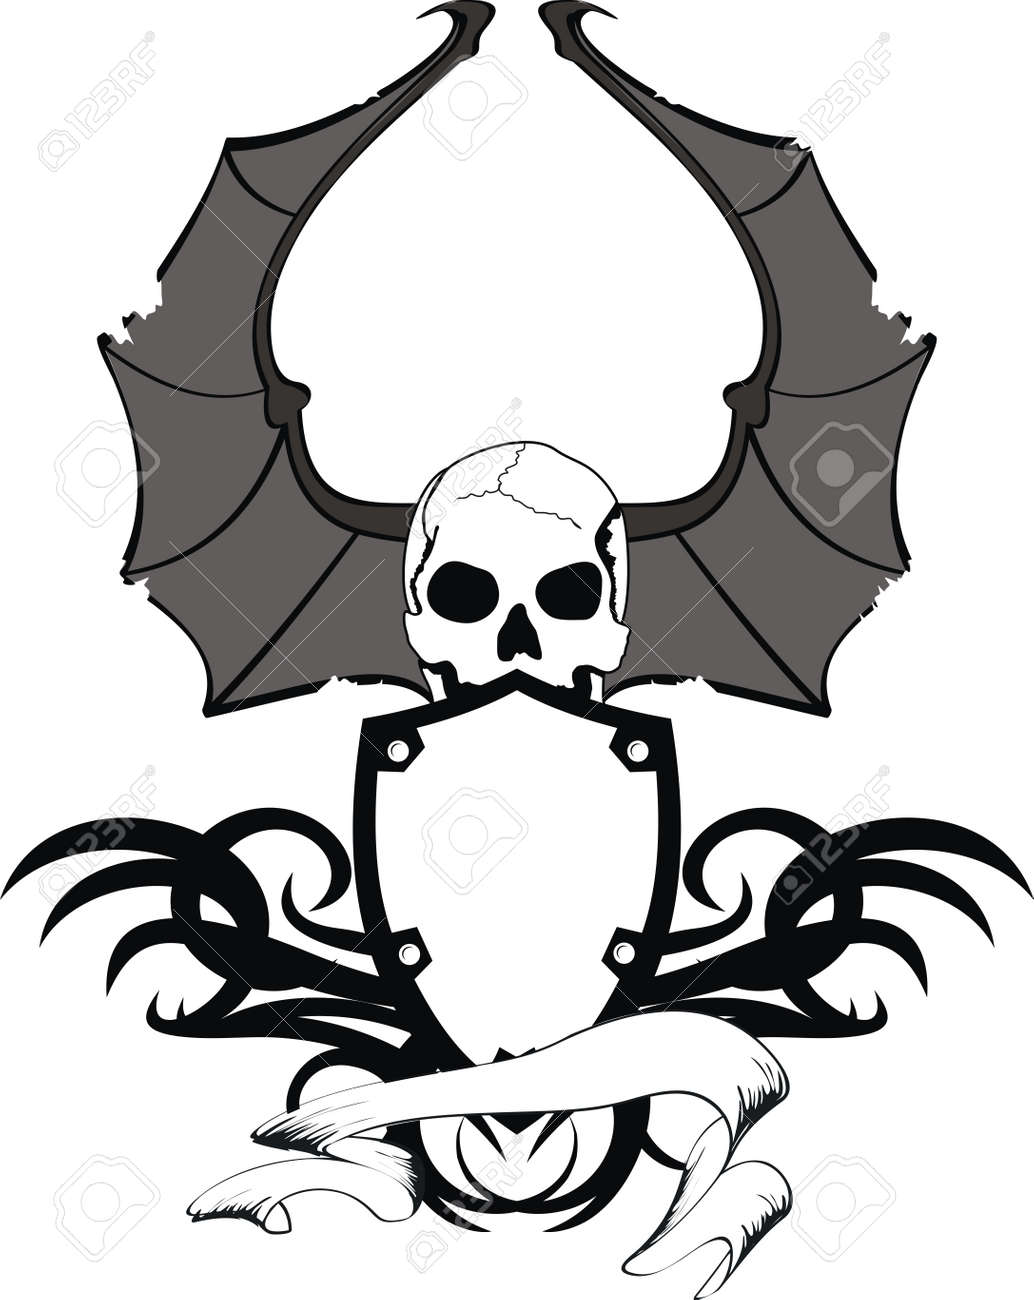 skull bat wings sticker tattoo royalty free cliparts vectors and rh 123rf com